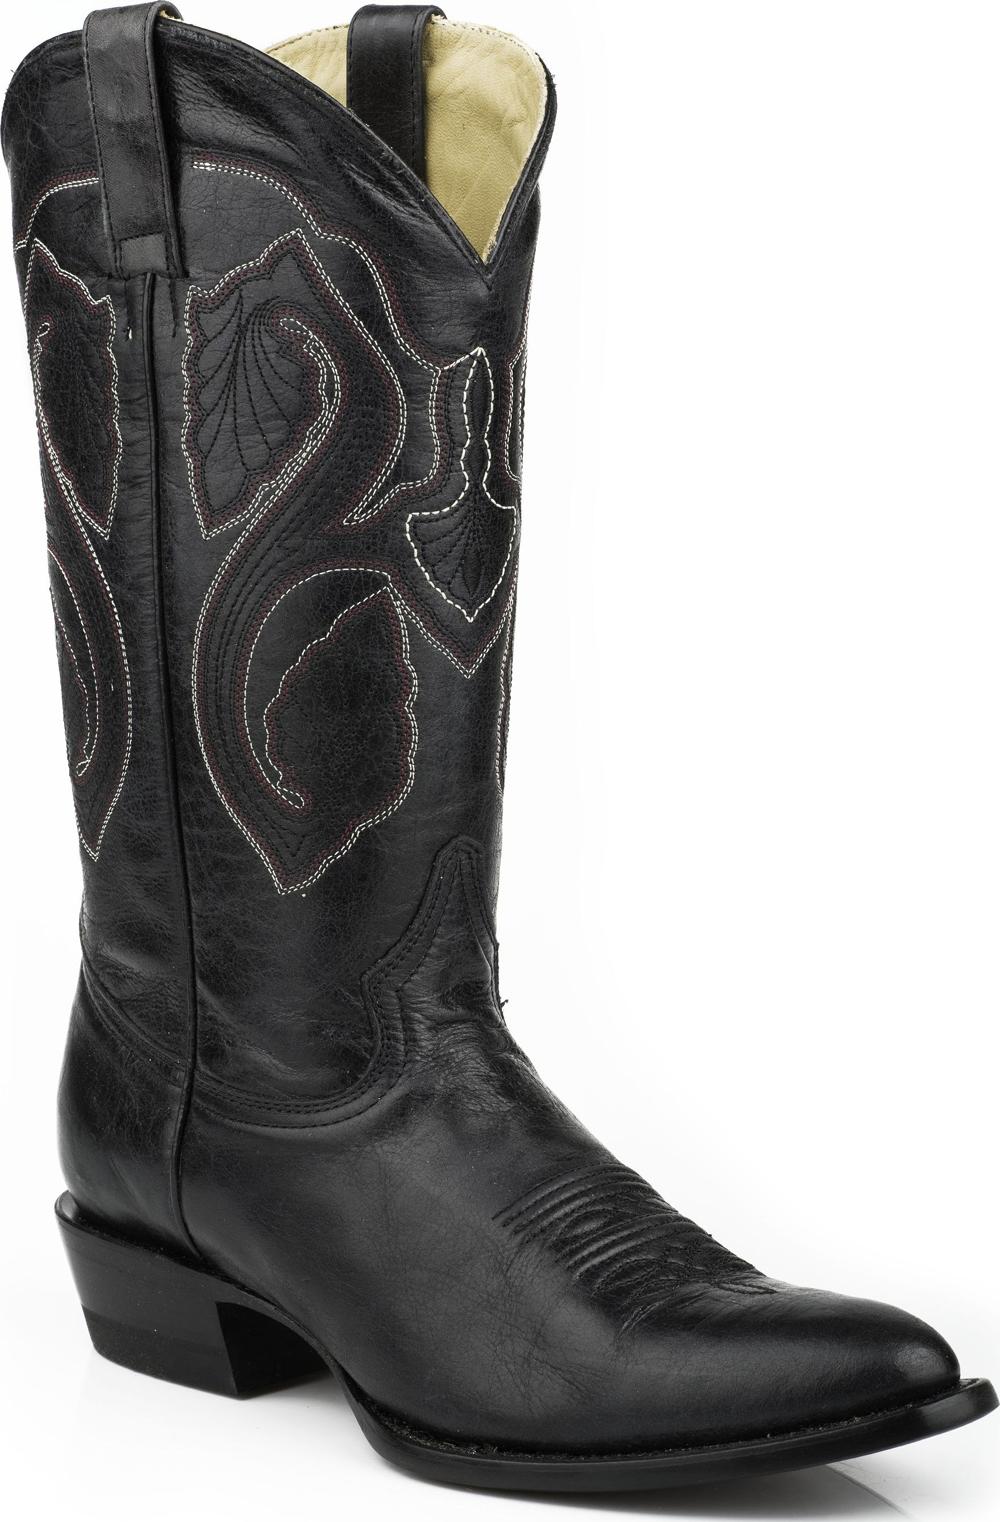 Stetson Men's Western Cowboy Leather Boots R Toe 0663 Black Medium (D, M) at Sears.com